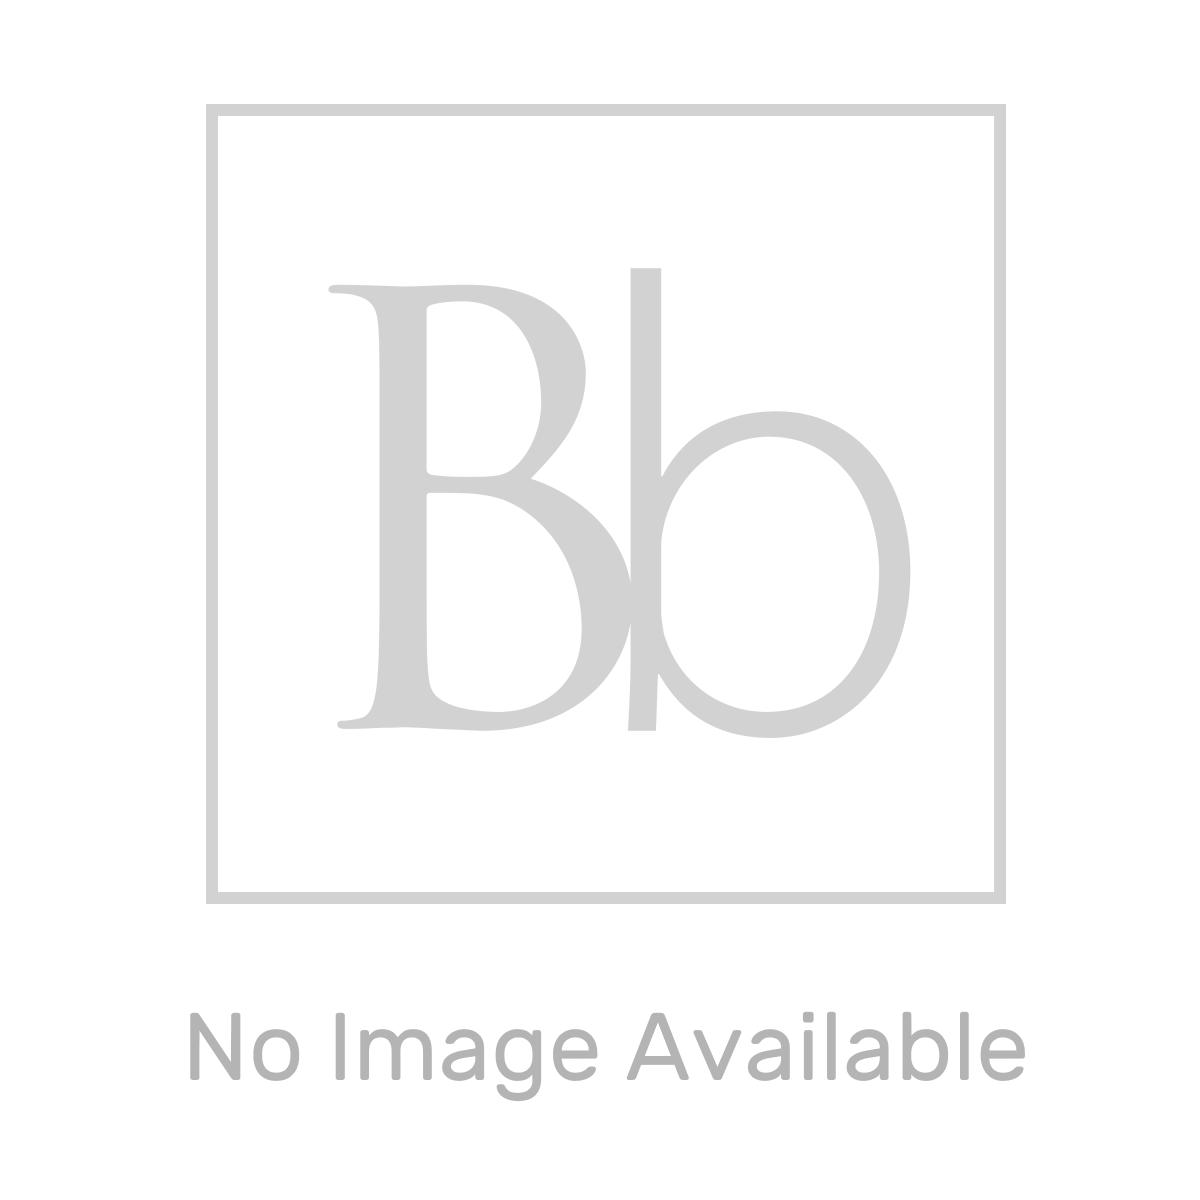 Ikoma White Gloss Vanity Unit with Basin 750mm Soft Close Drawer